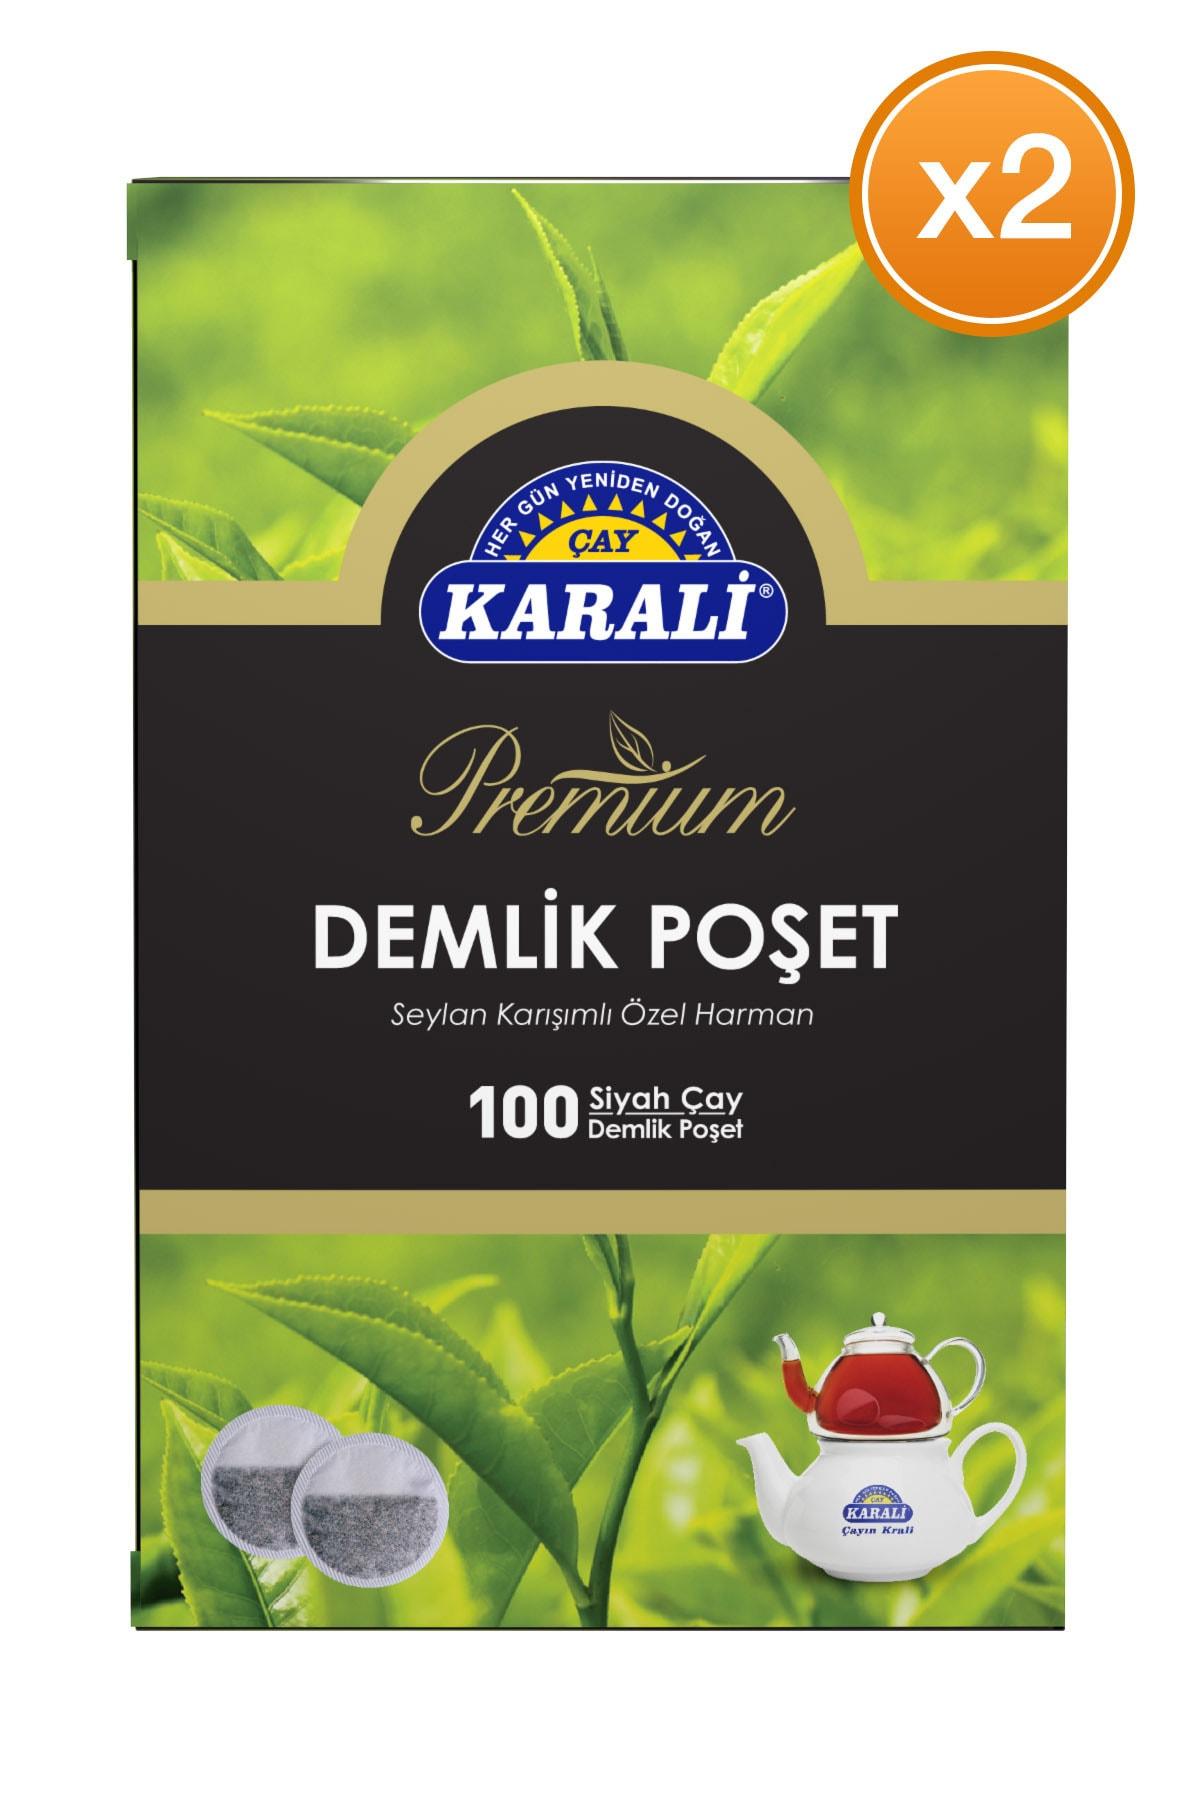 Karali Çay Karali Premium Demlik Poşet Siyah Çay 100x3,2 gr X 2 Adet 2